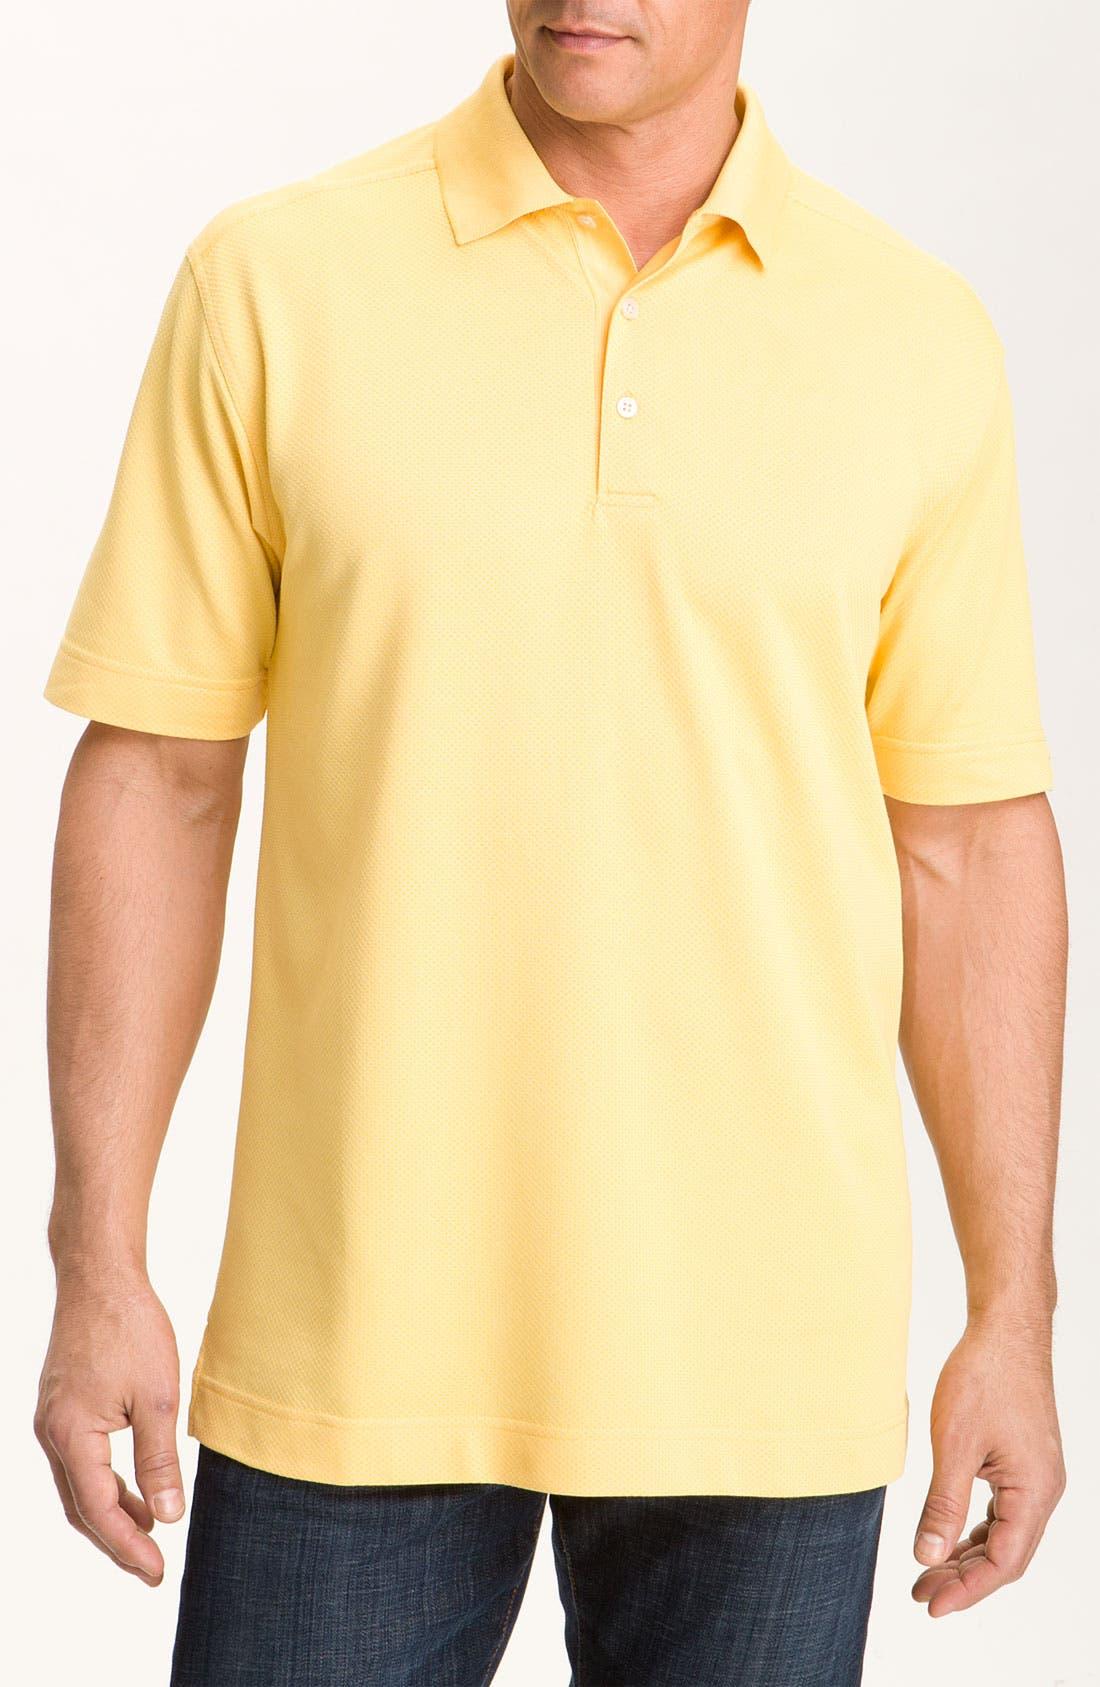 Alternate Image 1 Selected - Cutter & Buck 'Nano' DryTec Golf Polo (Big & Tall)